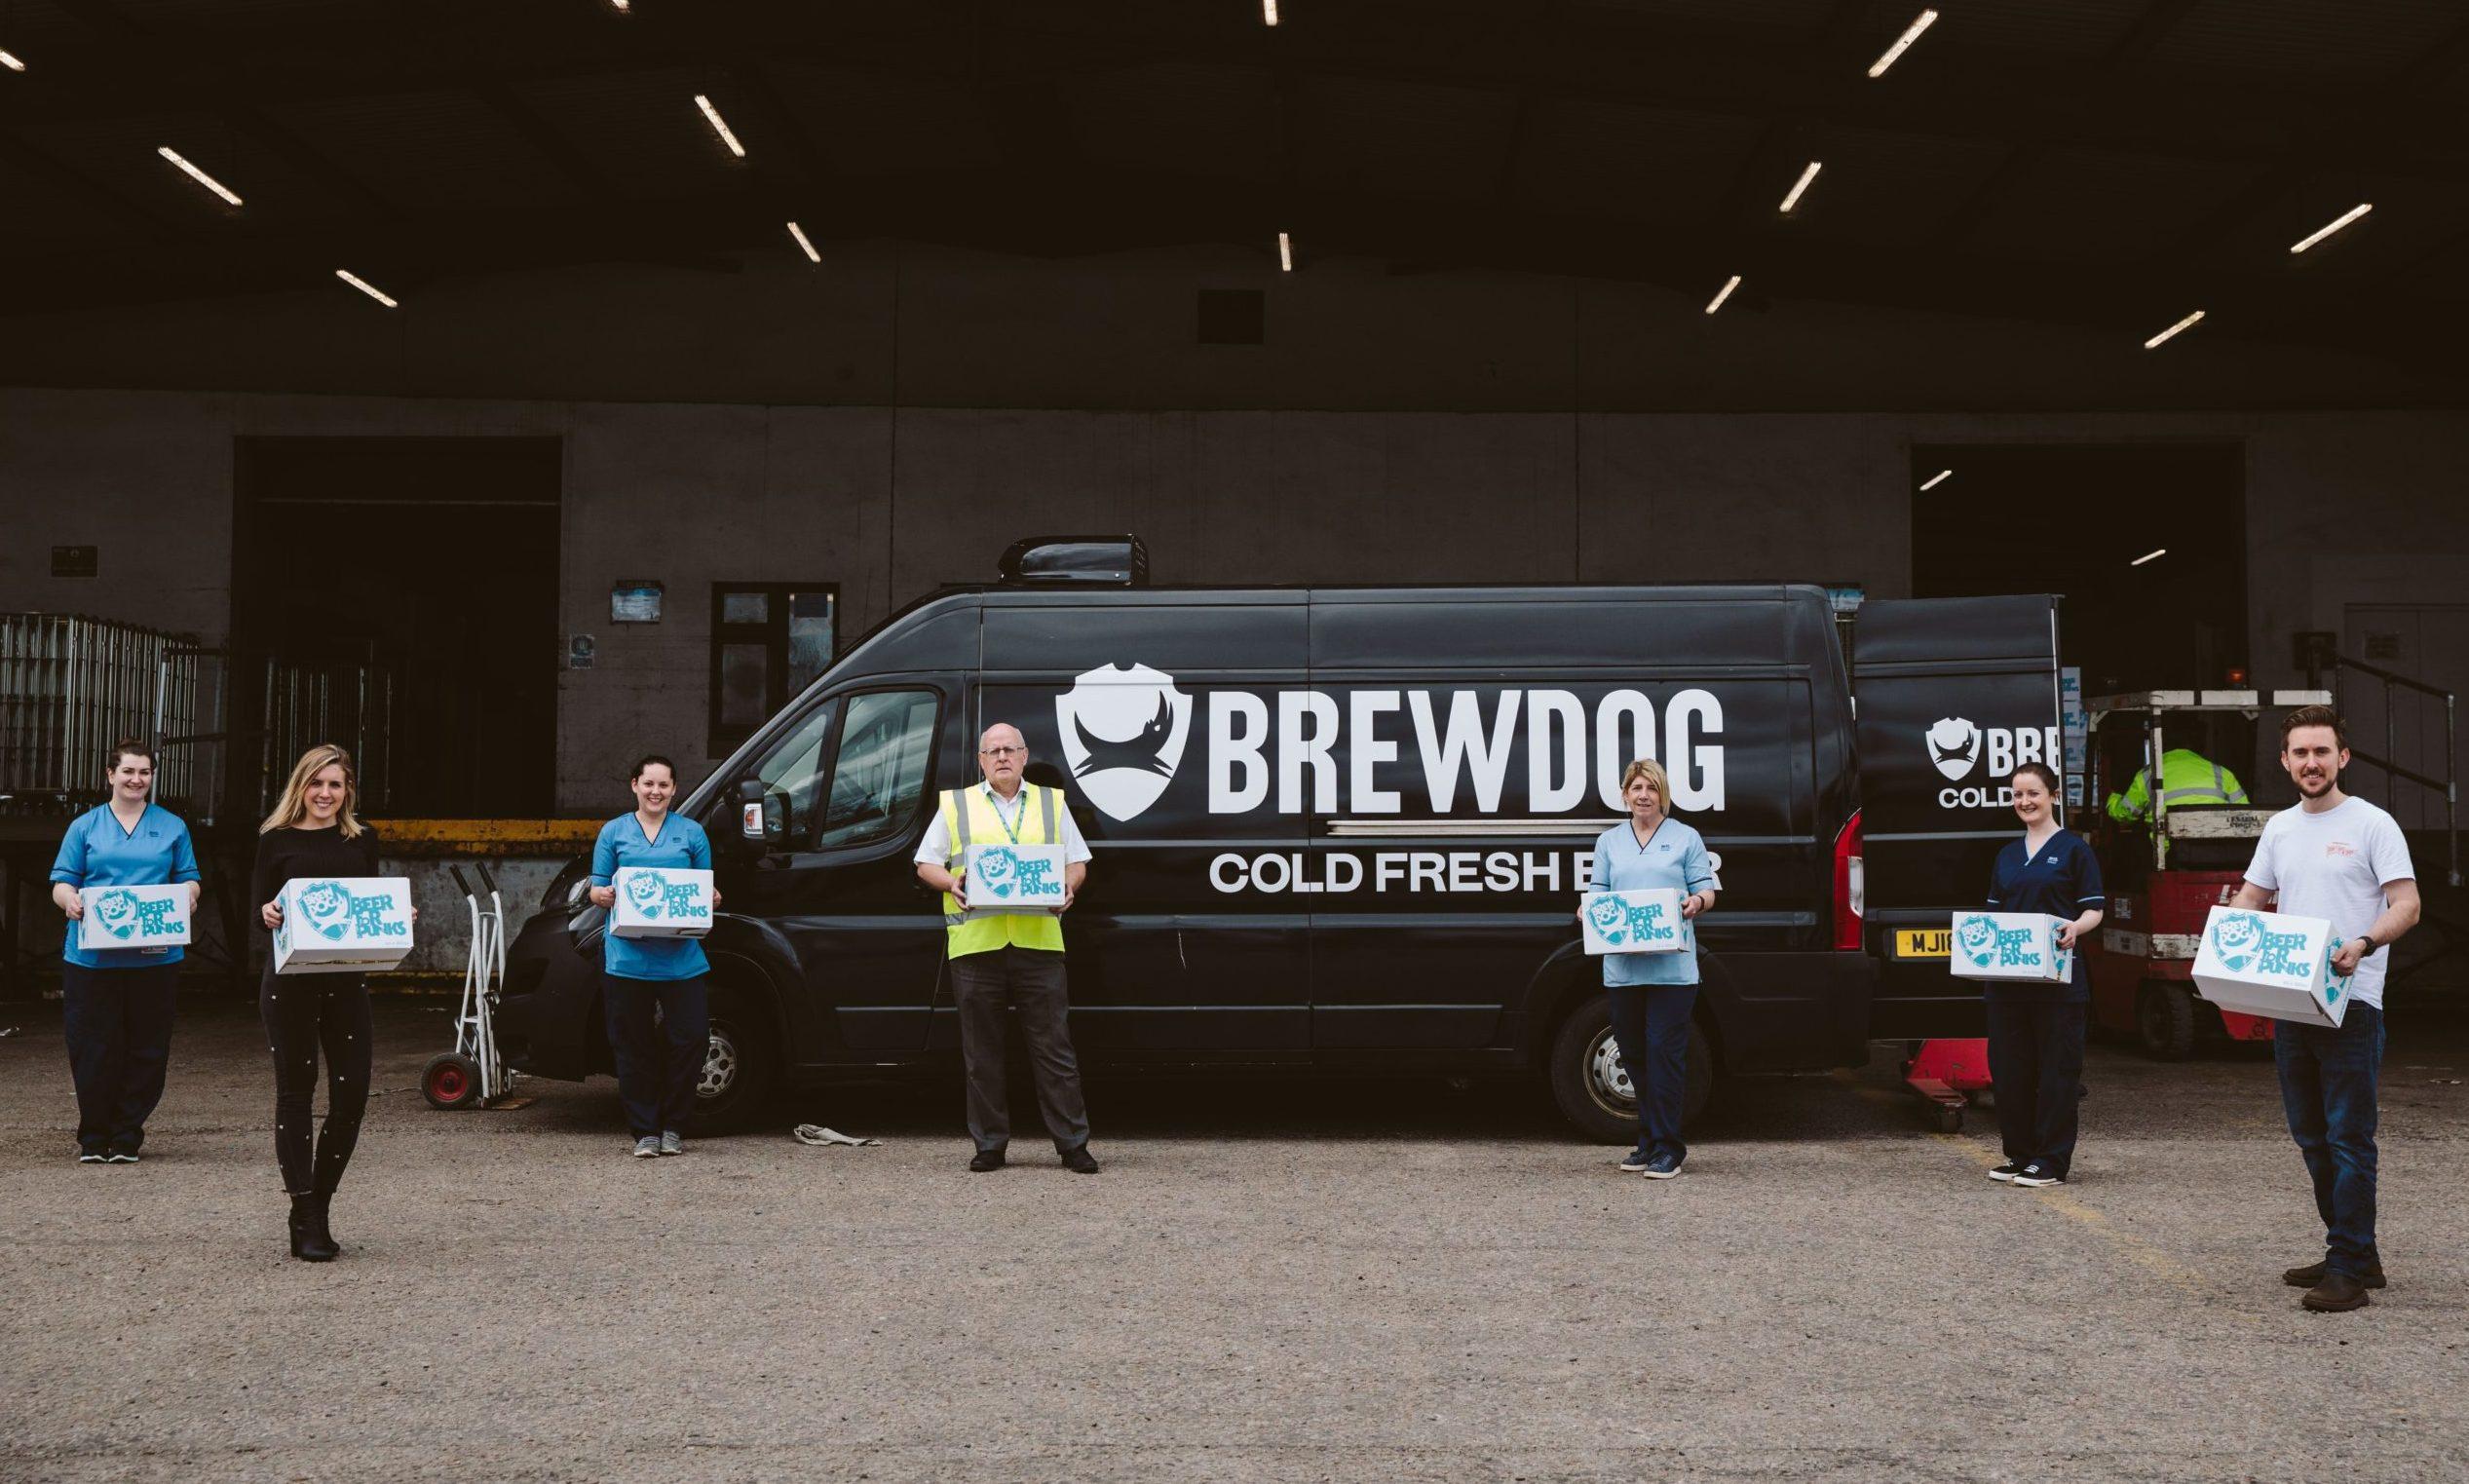 NHS staff receive a delivery of Brewdog's sanitiser